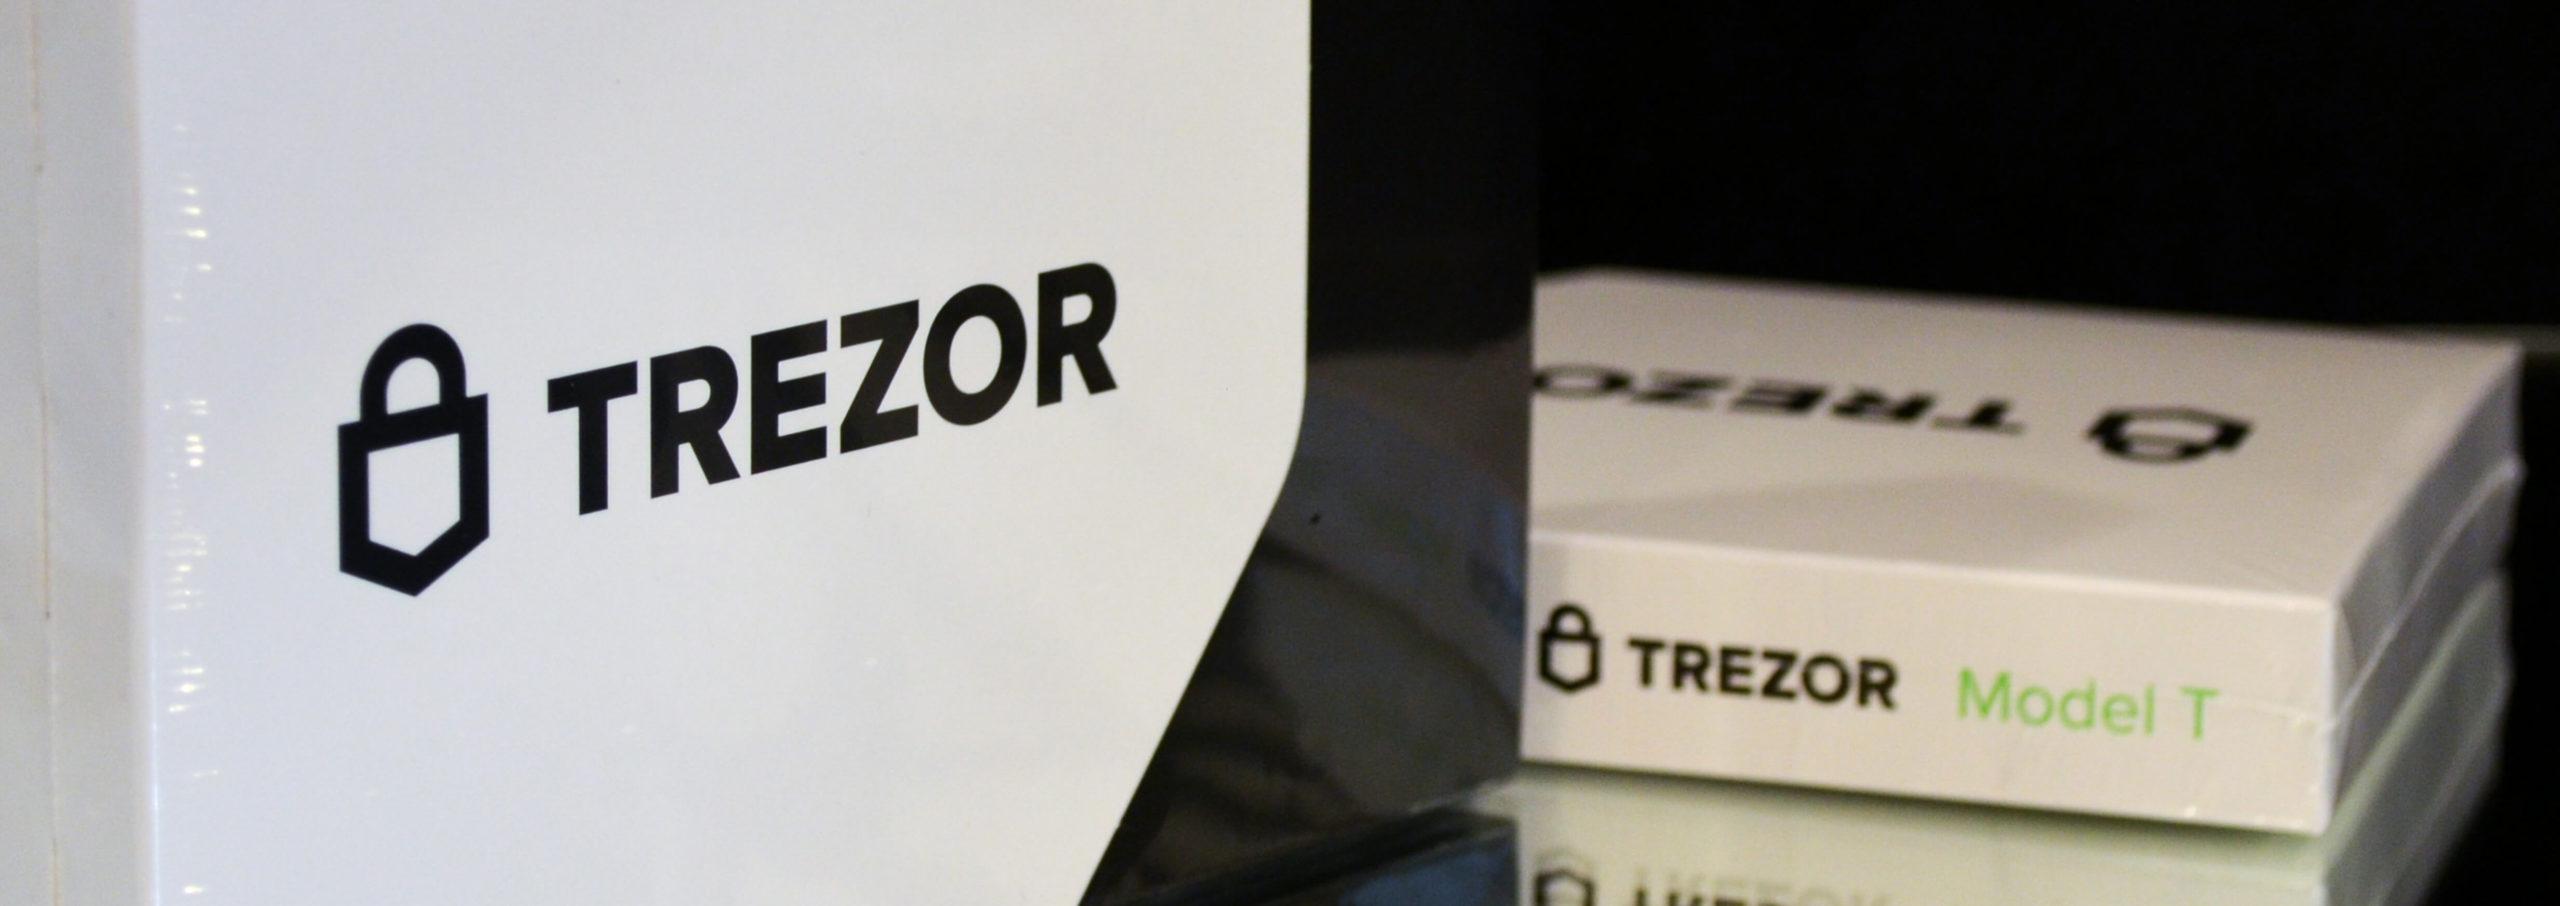 Trezor Model T BitcoinBG